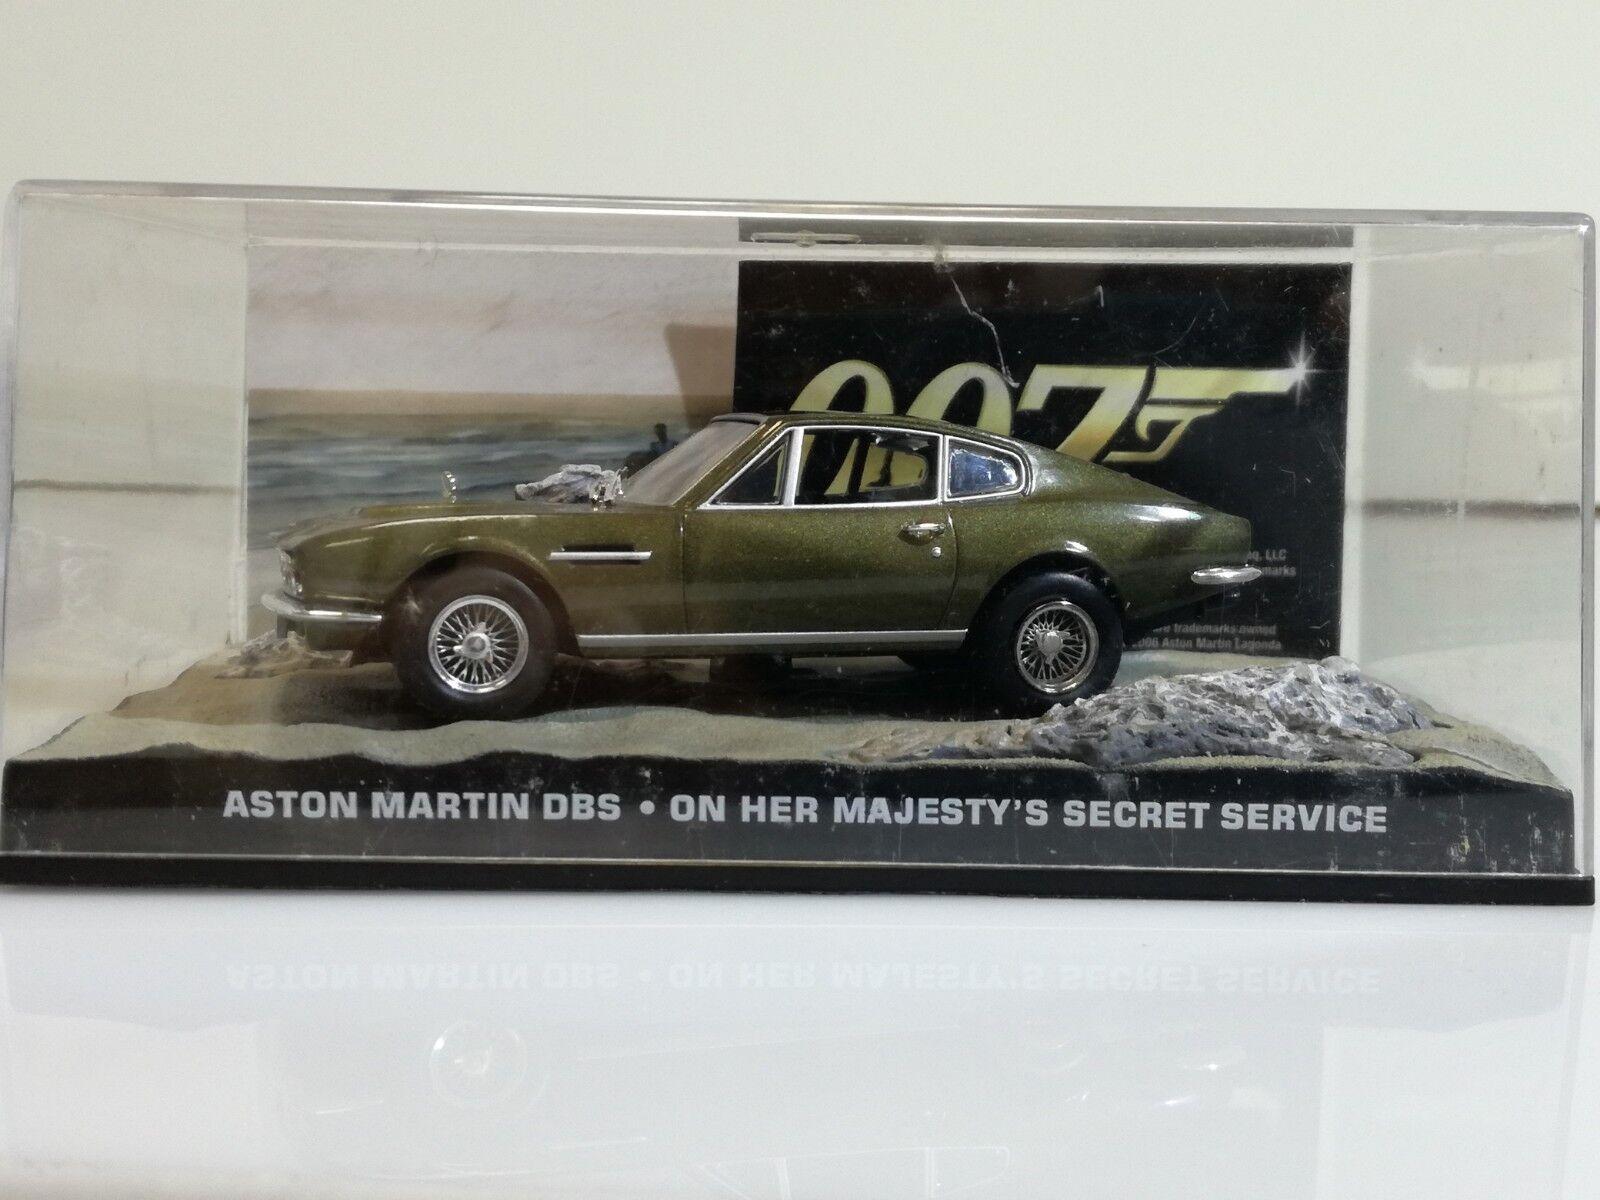 James Bond 007 - Aston Martin DBS - On her Majesty´s Secret Service